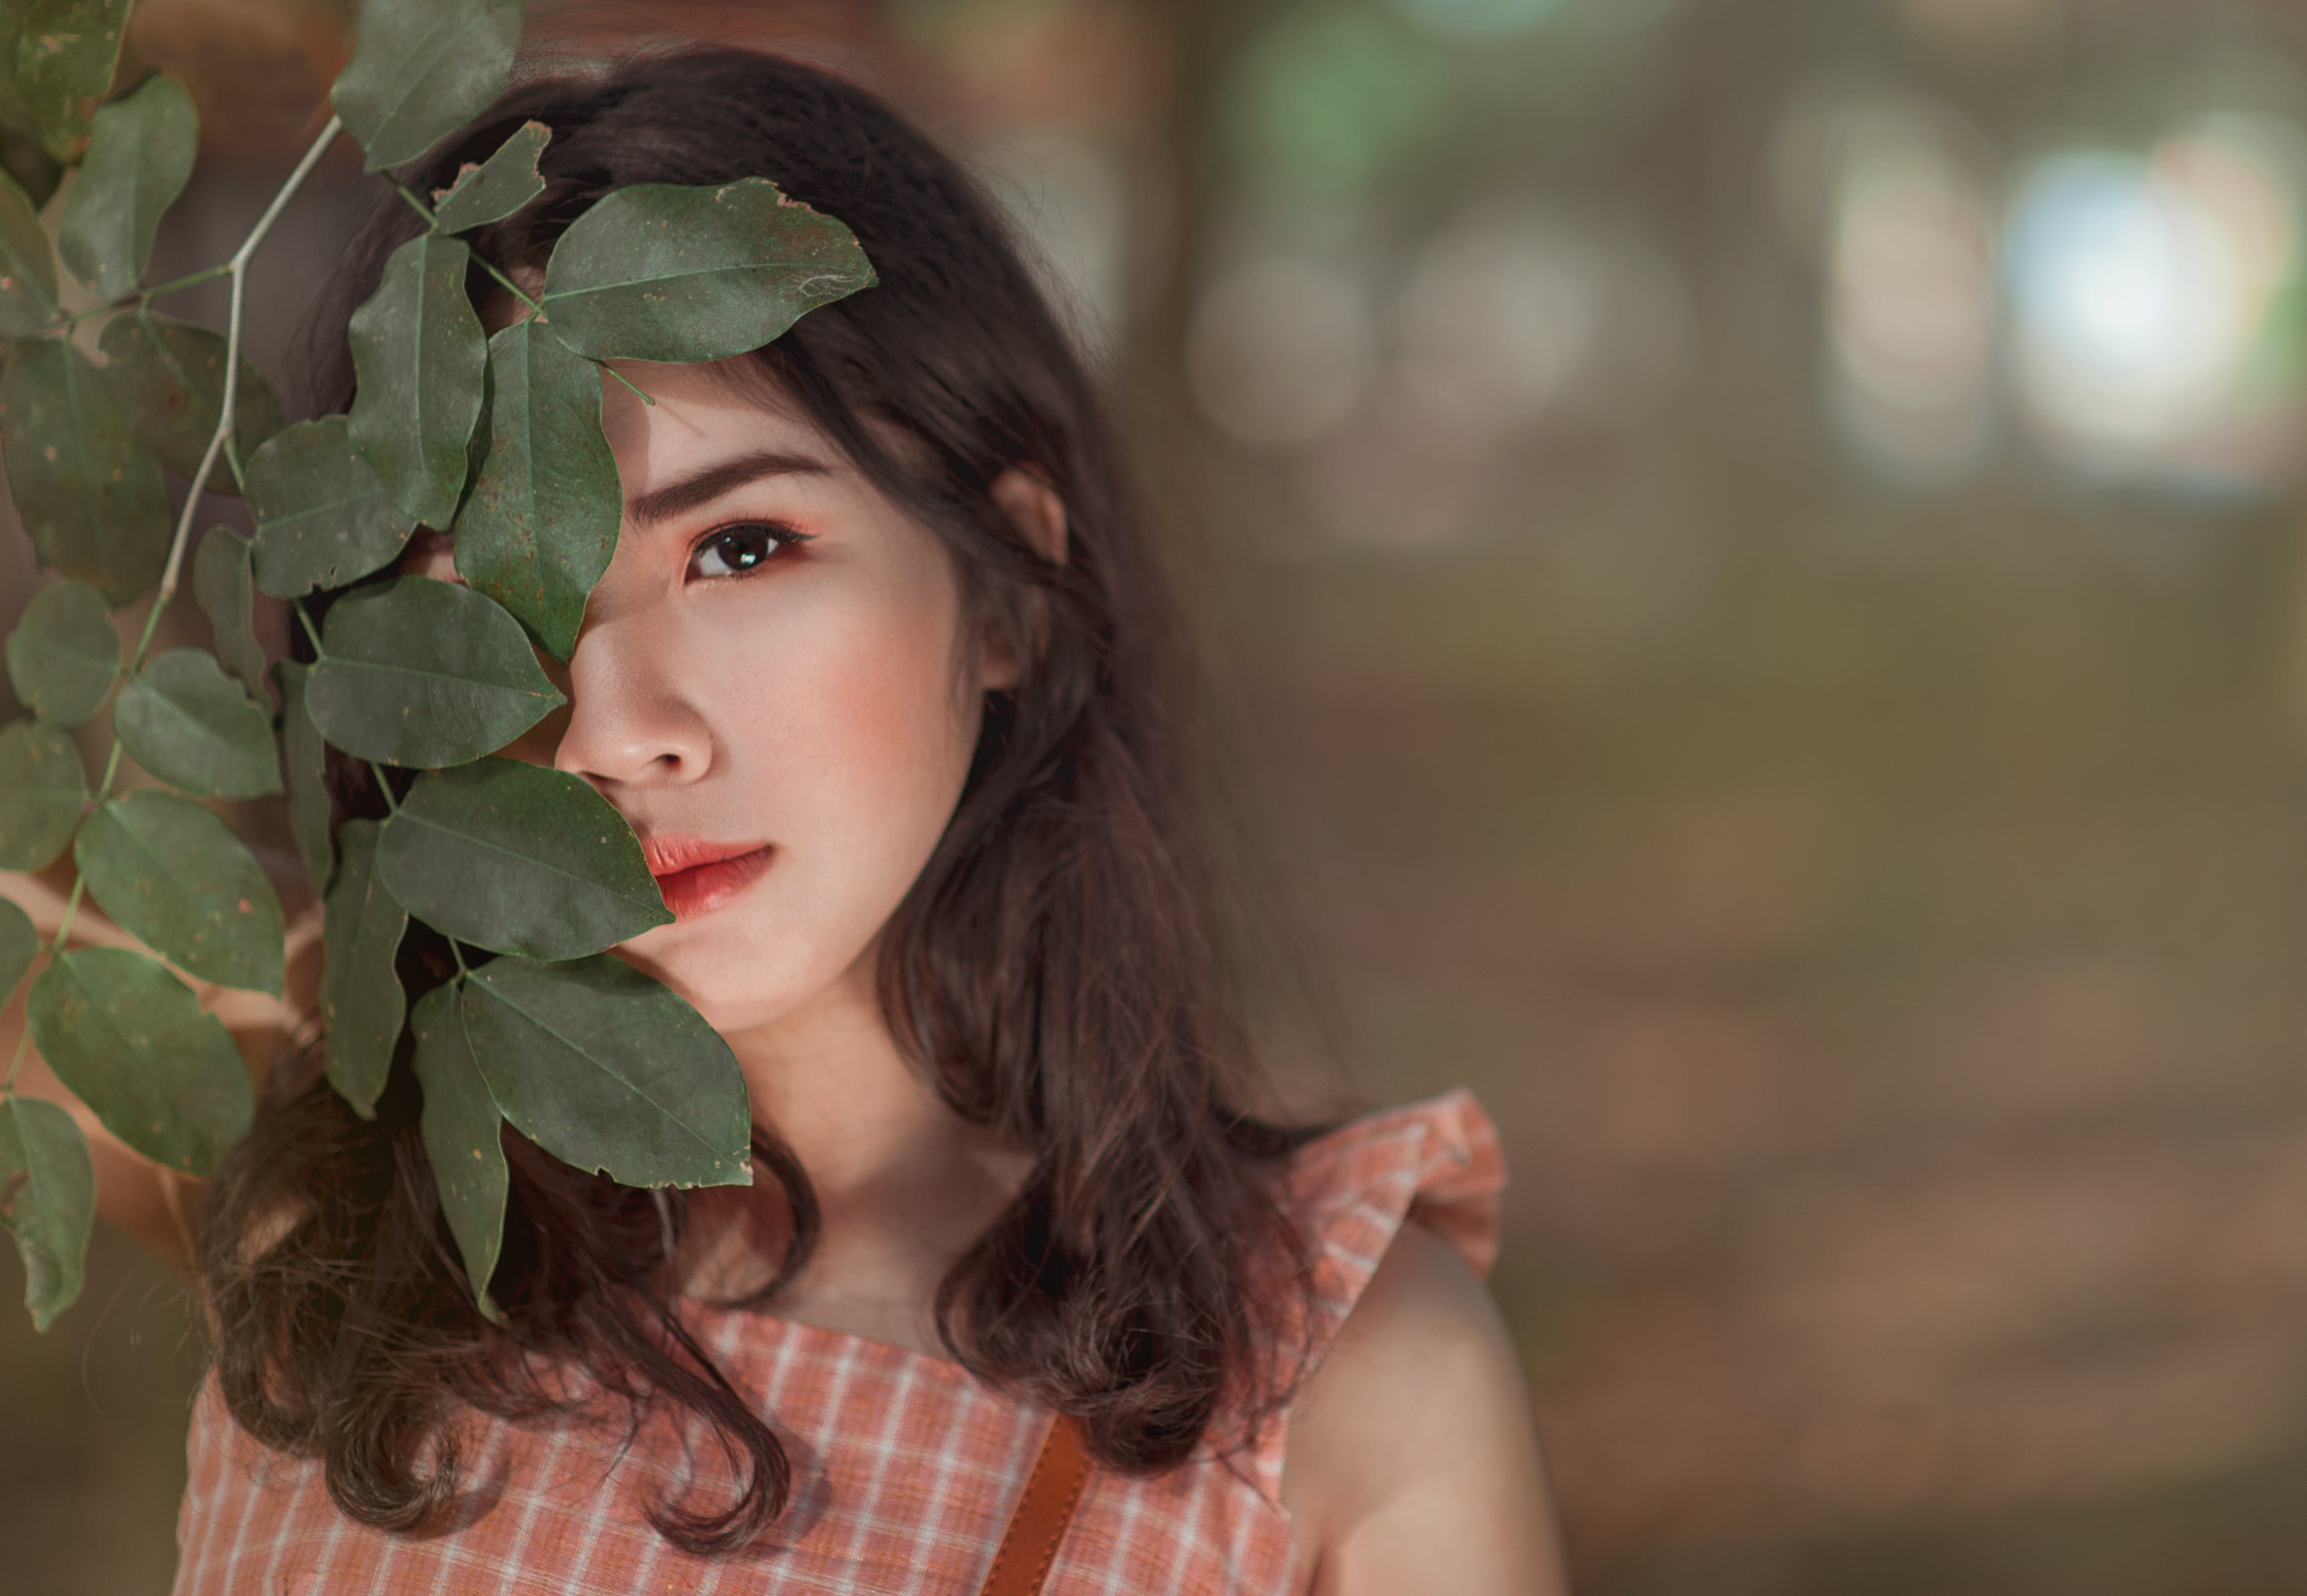 Woman Wearing Pink Sleeveless Top Behind Leaves